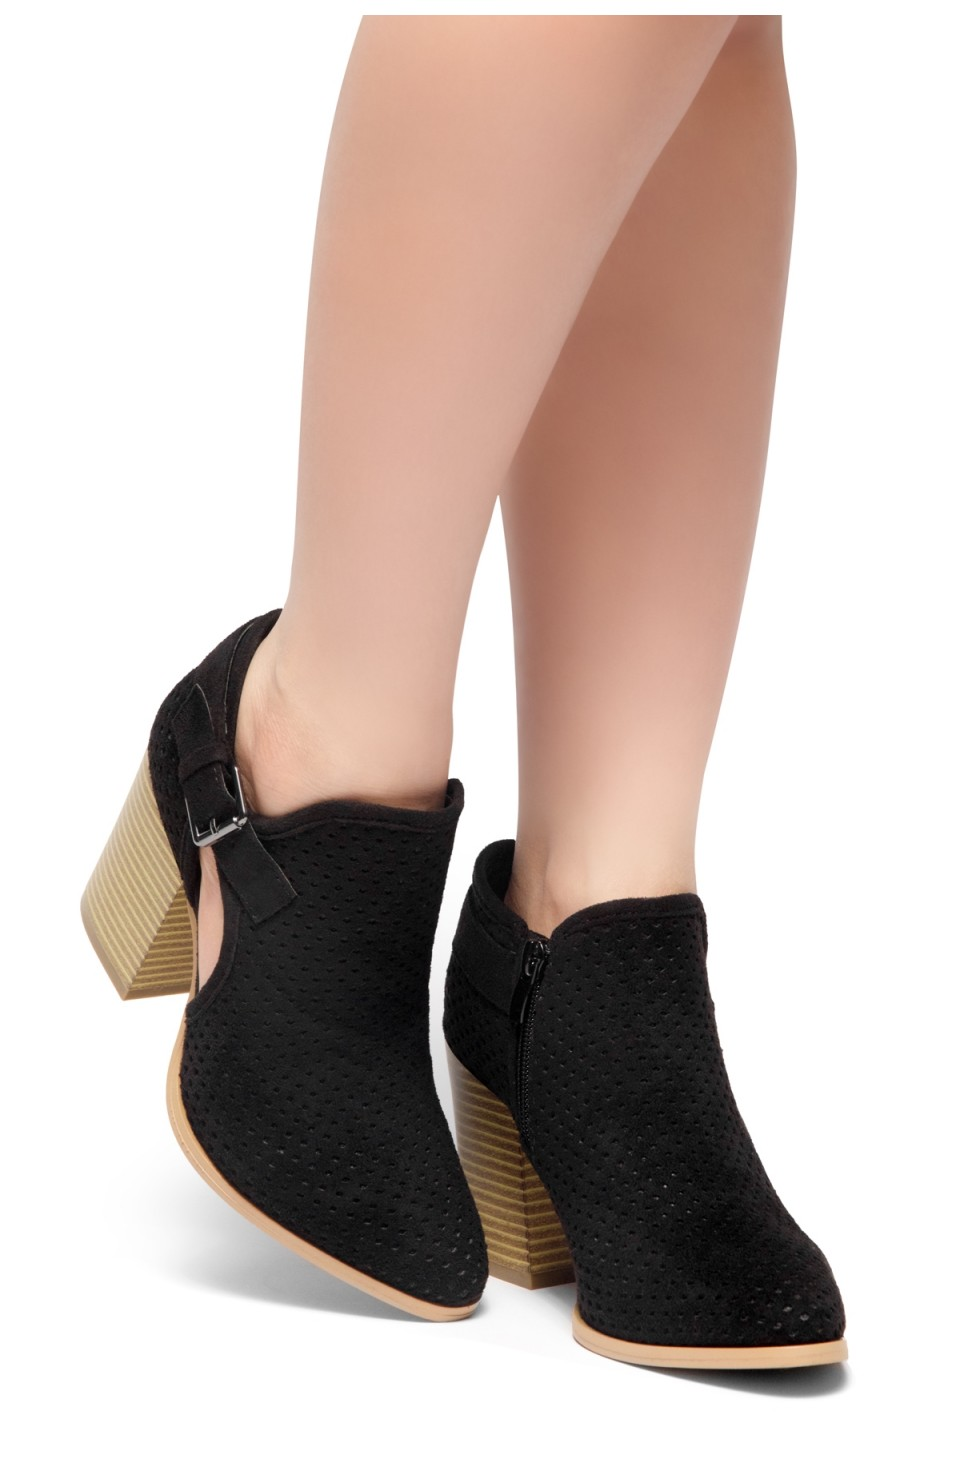 HerStyle NOMAD-Stacked Heel Almond Toe Booties (Black)